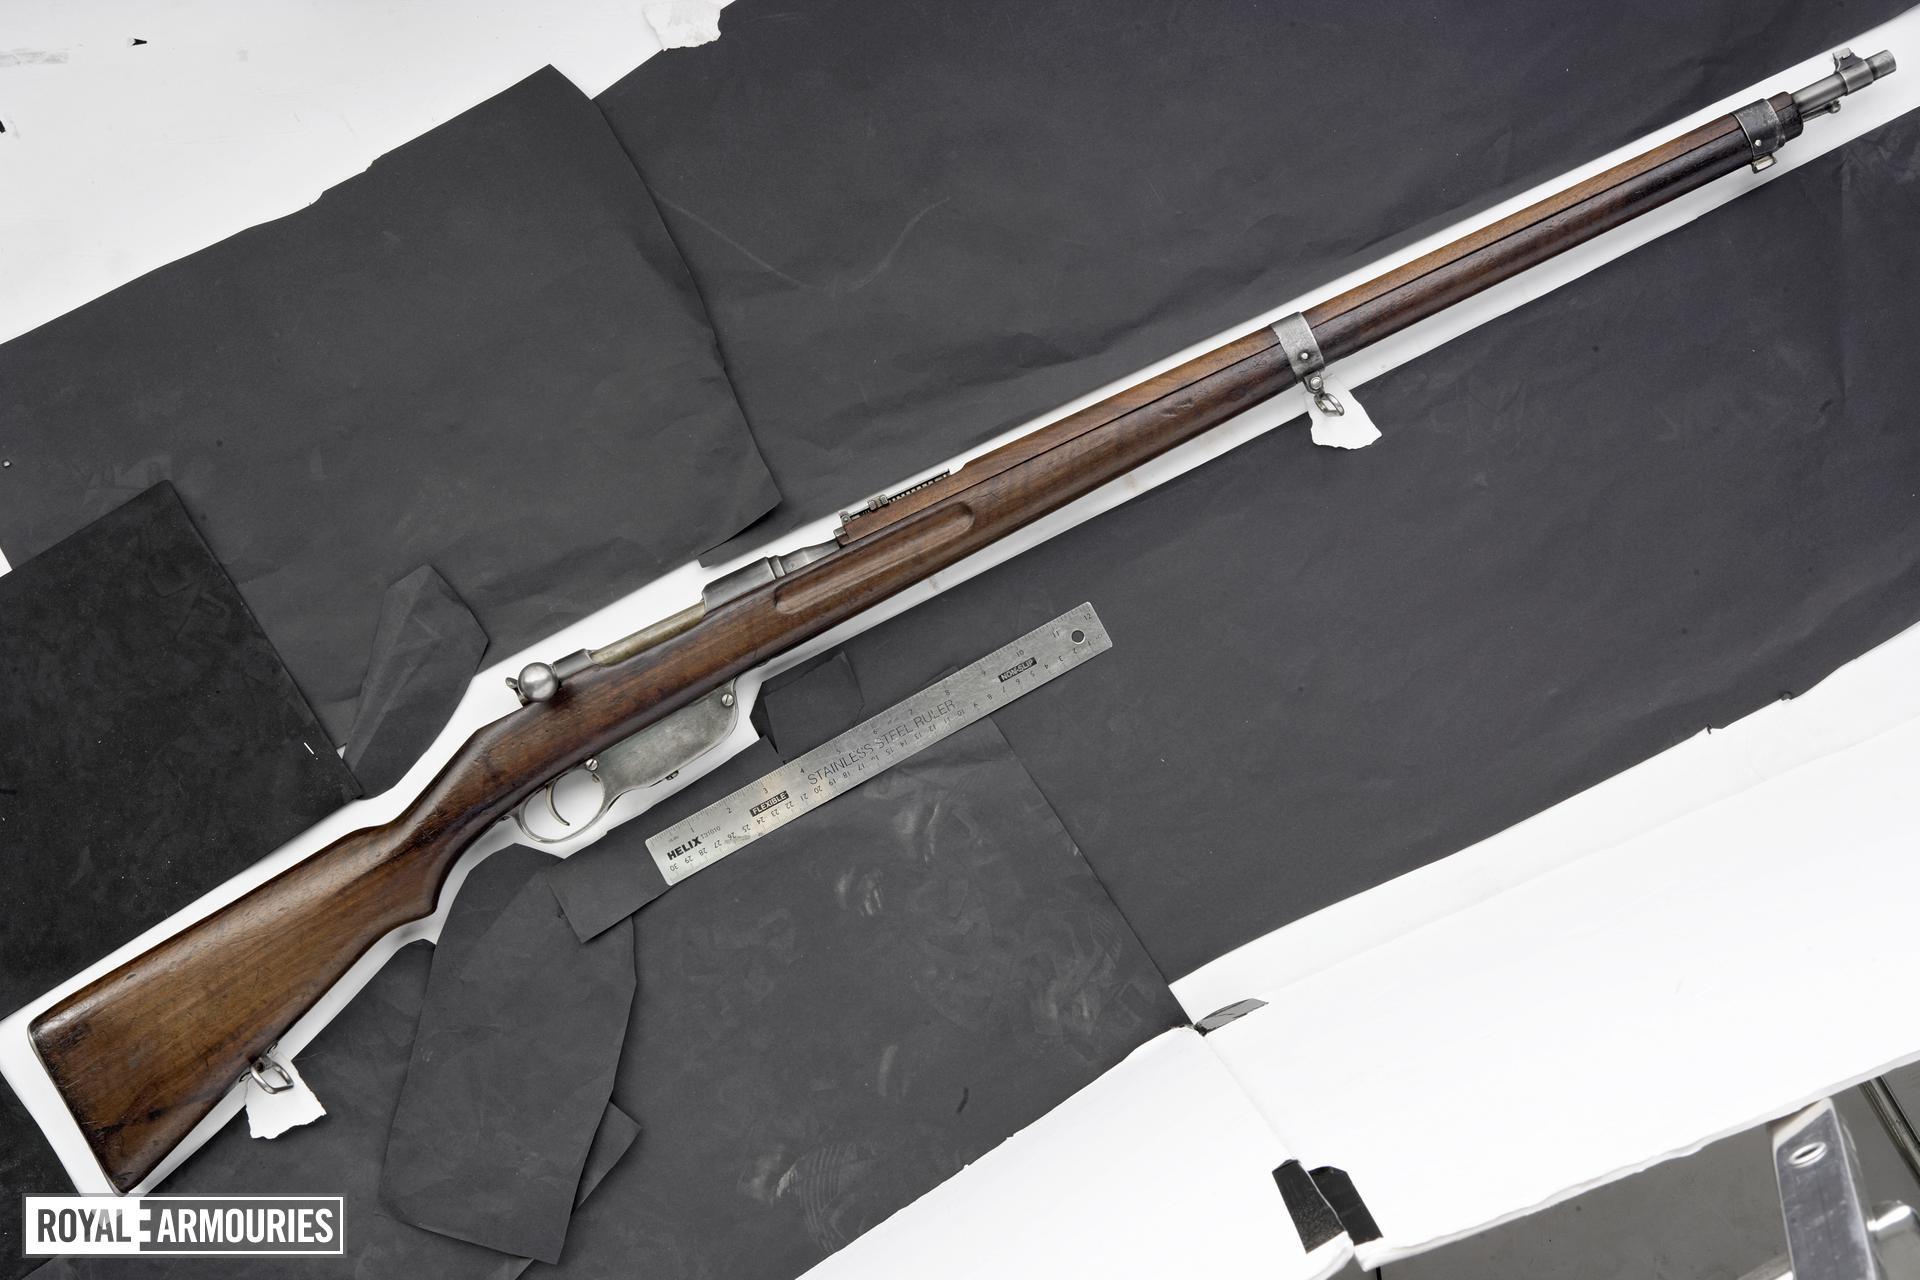 Centrefire bolt-action rifle - Mannlicher Model 1895S